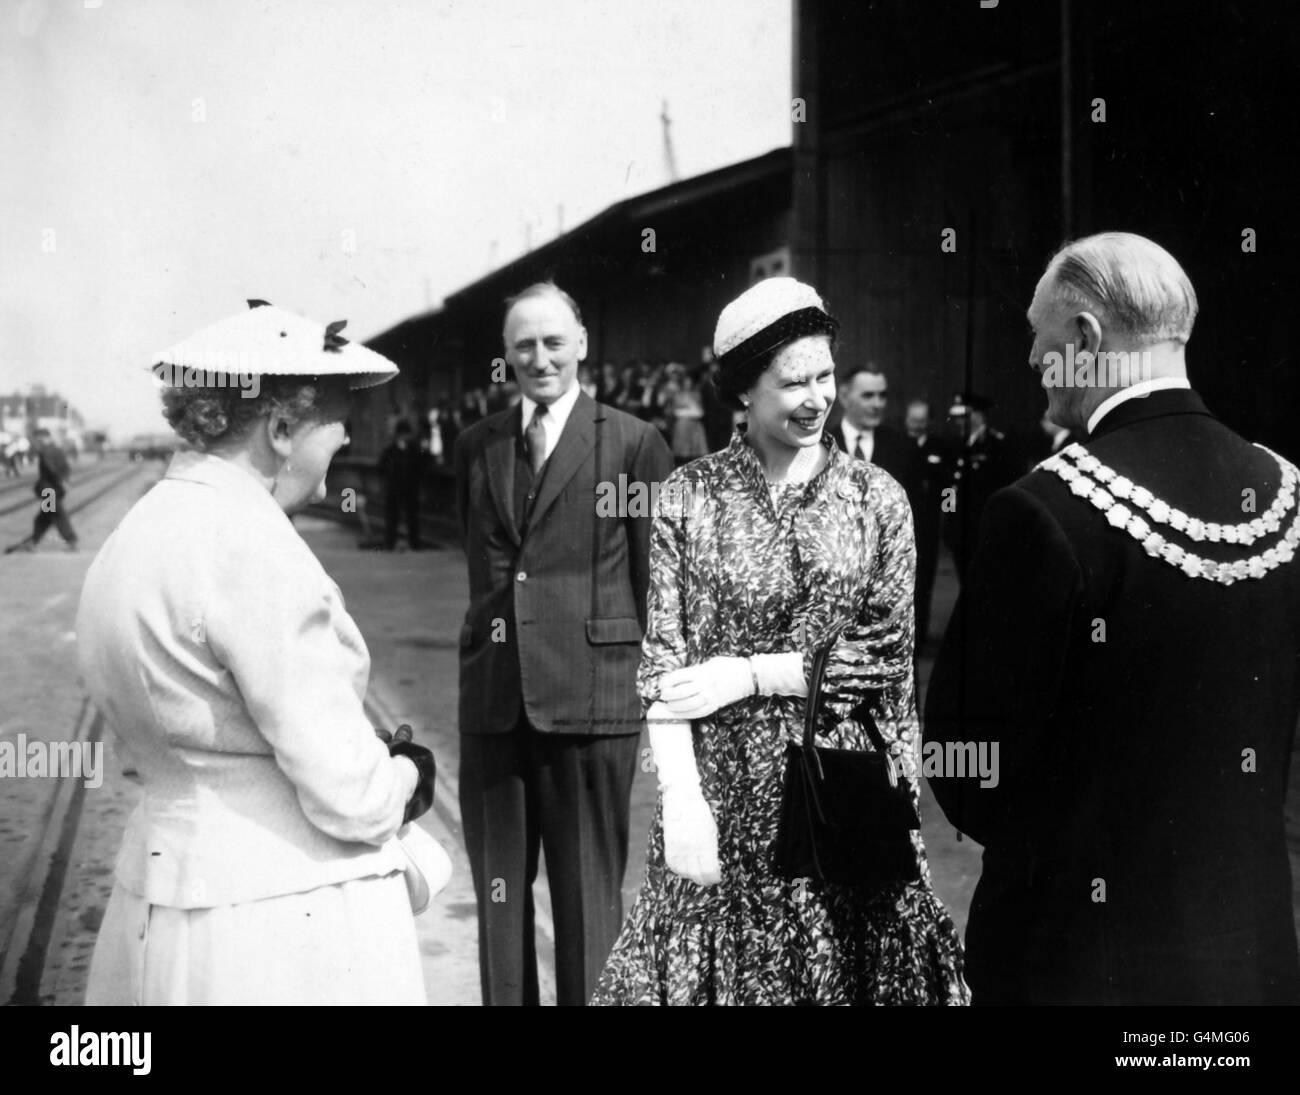 Royalty - Queen Elizabeth II Port of London Visit - London - Stock Image